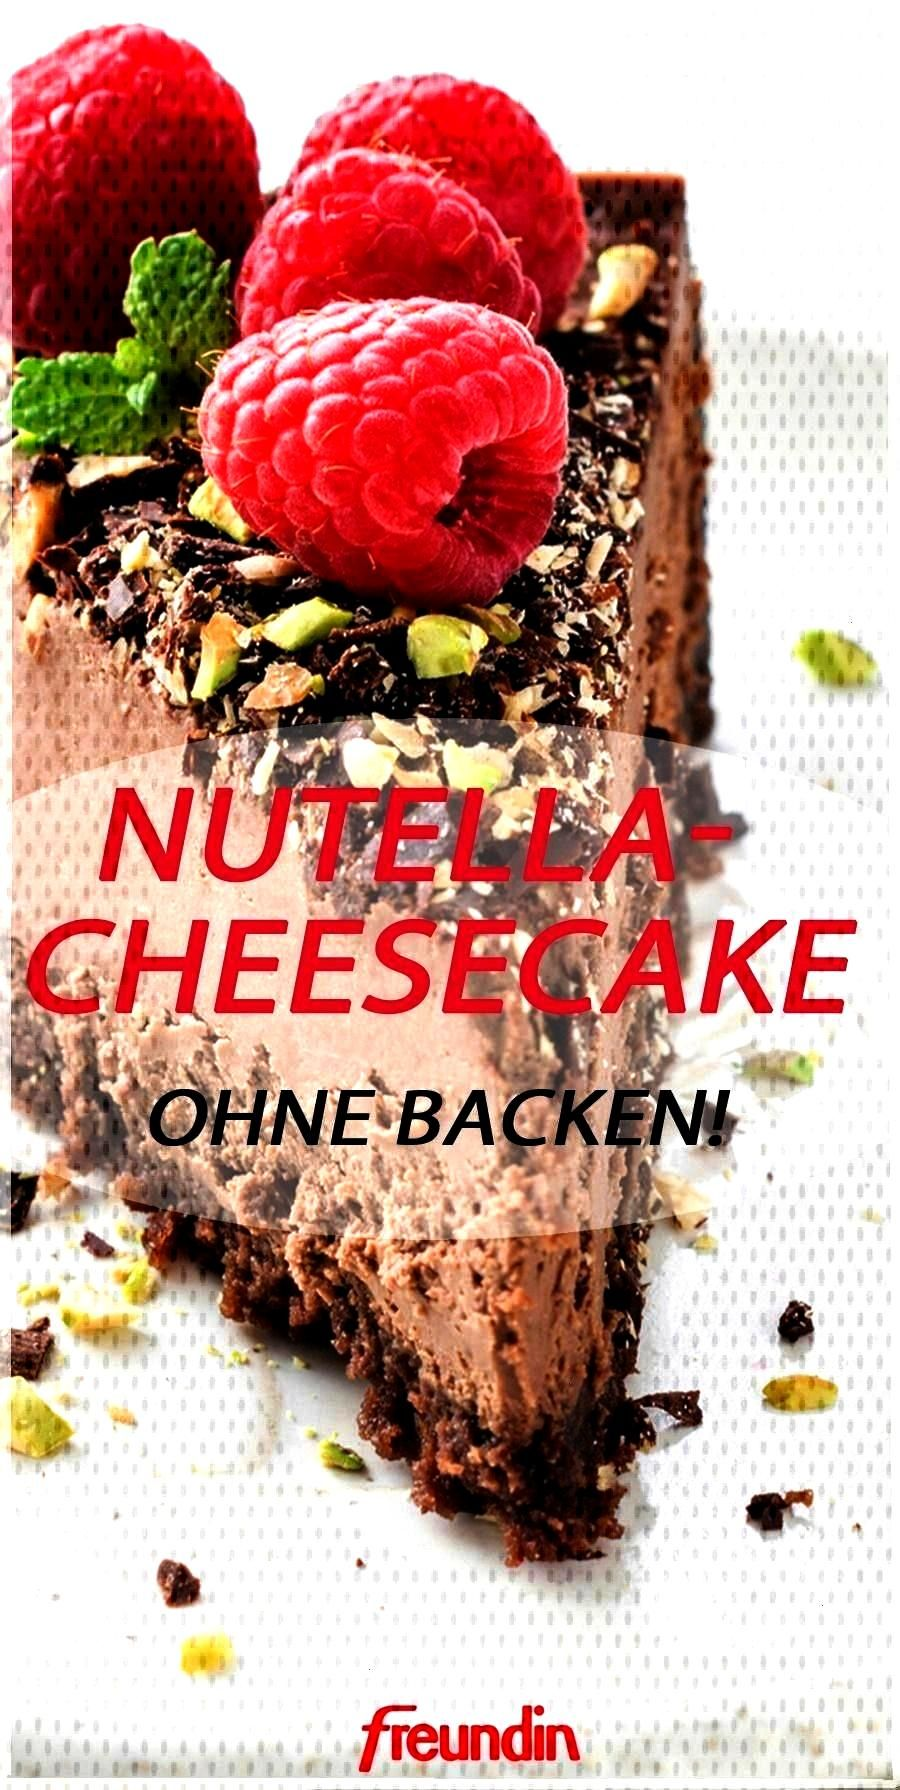 #perfectcheesecake #cucamelonrecipes #nutellarecipes #gnocchirecipes #seafoodrecipes #raviolirecipes...